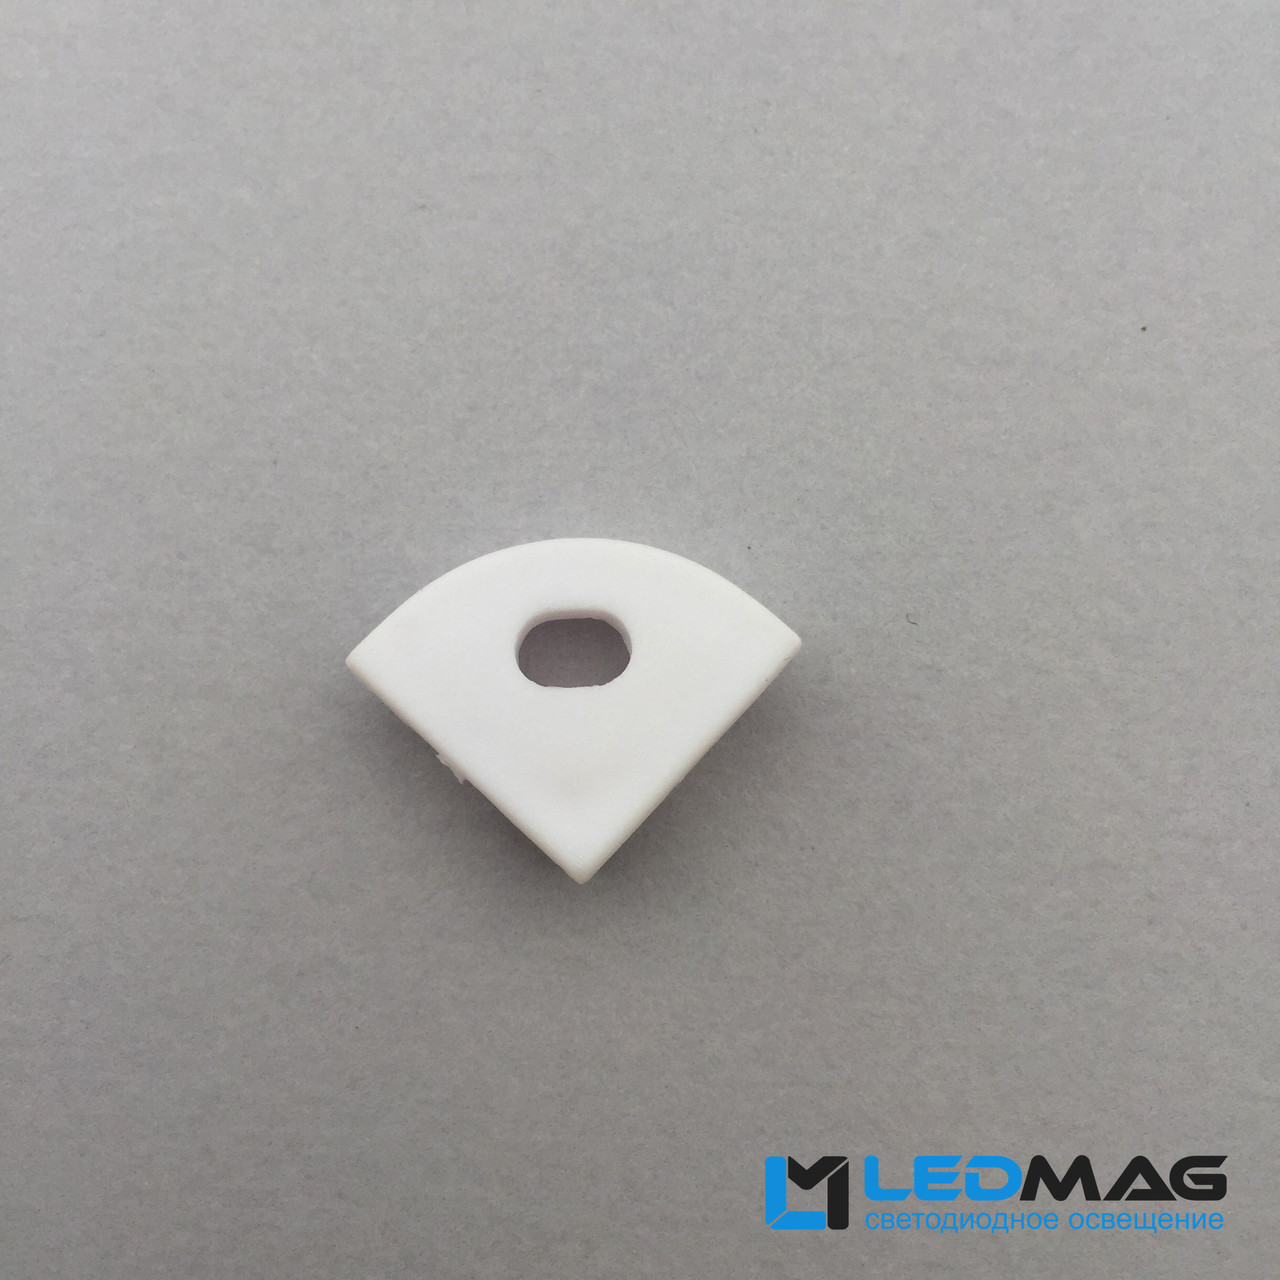 Боковая заглушка профиля для углового LED профиля 16 х 16 мм радиальная